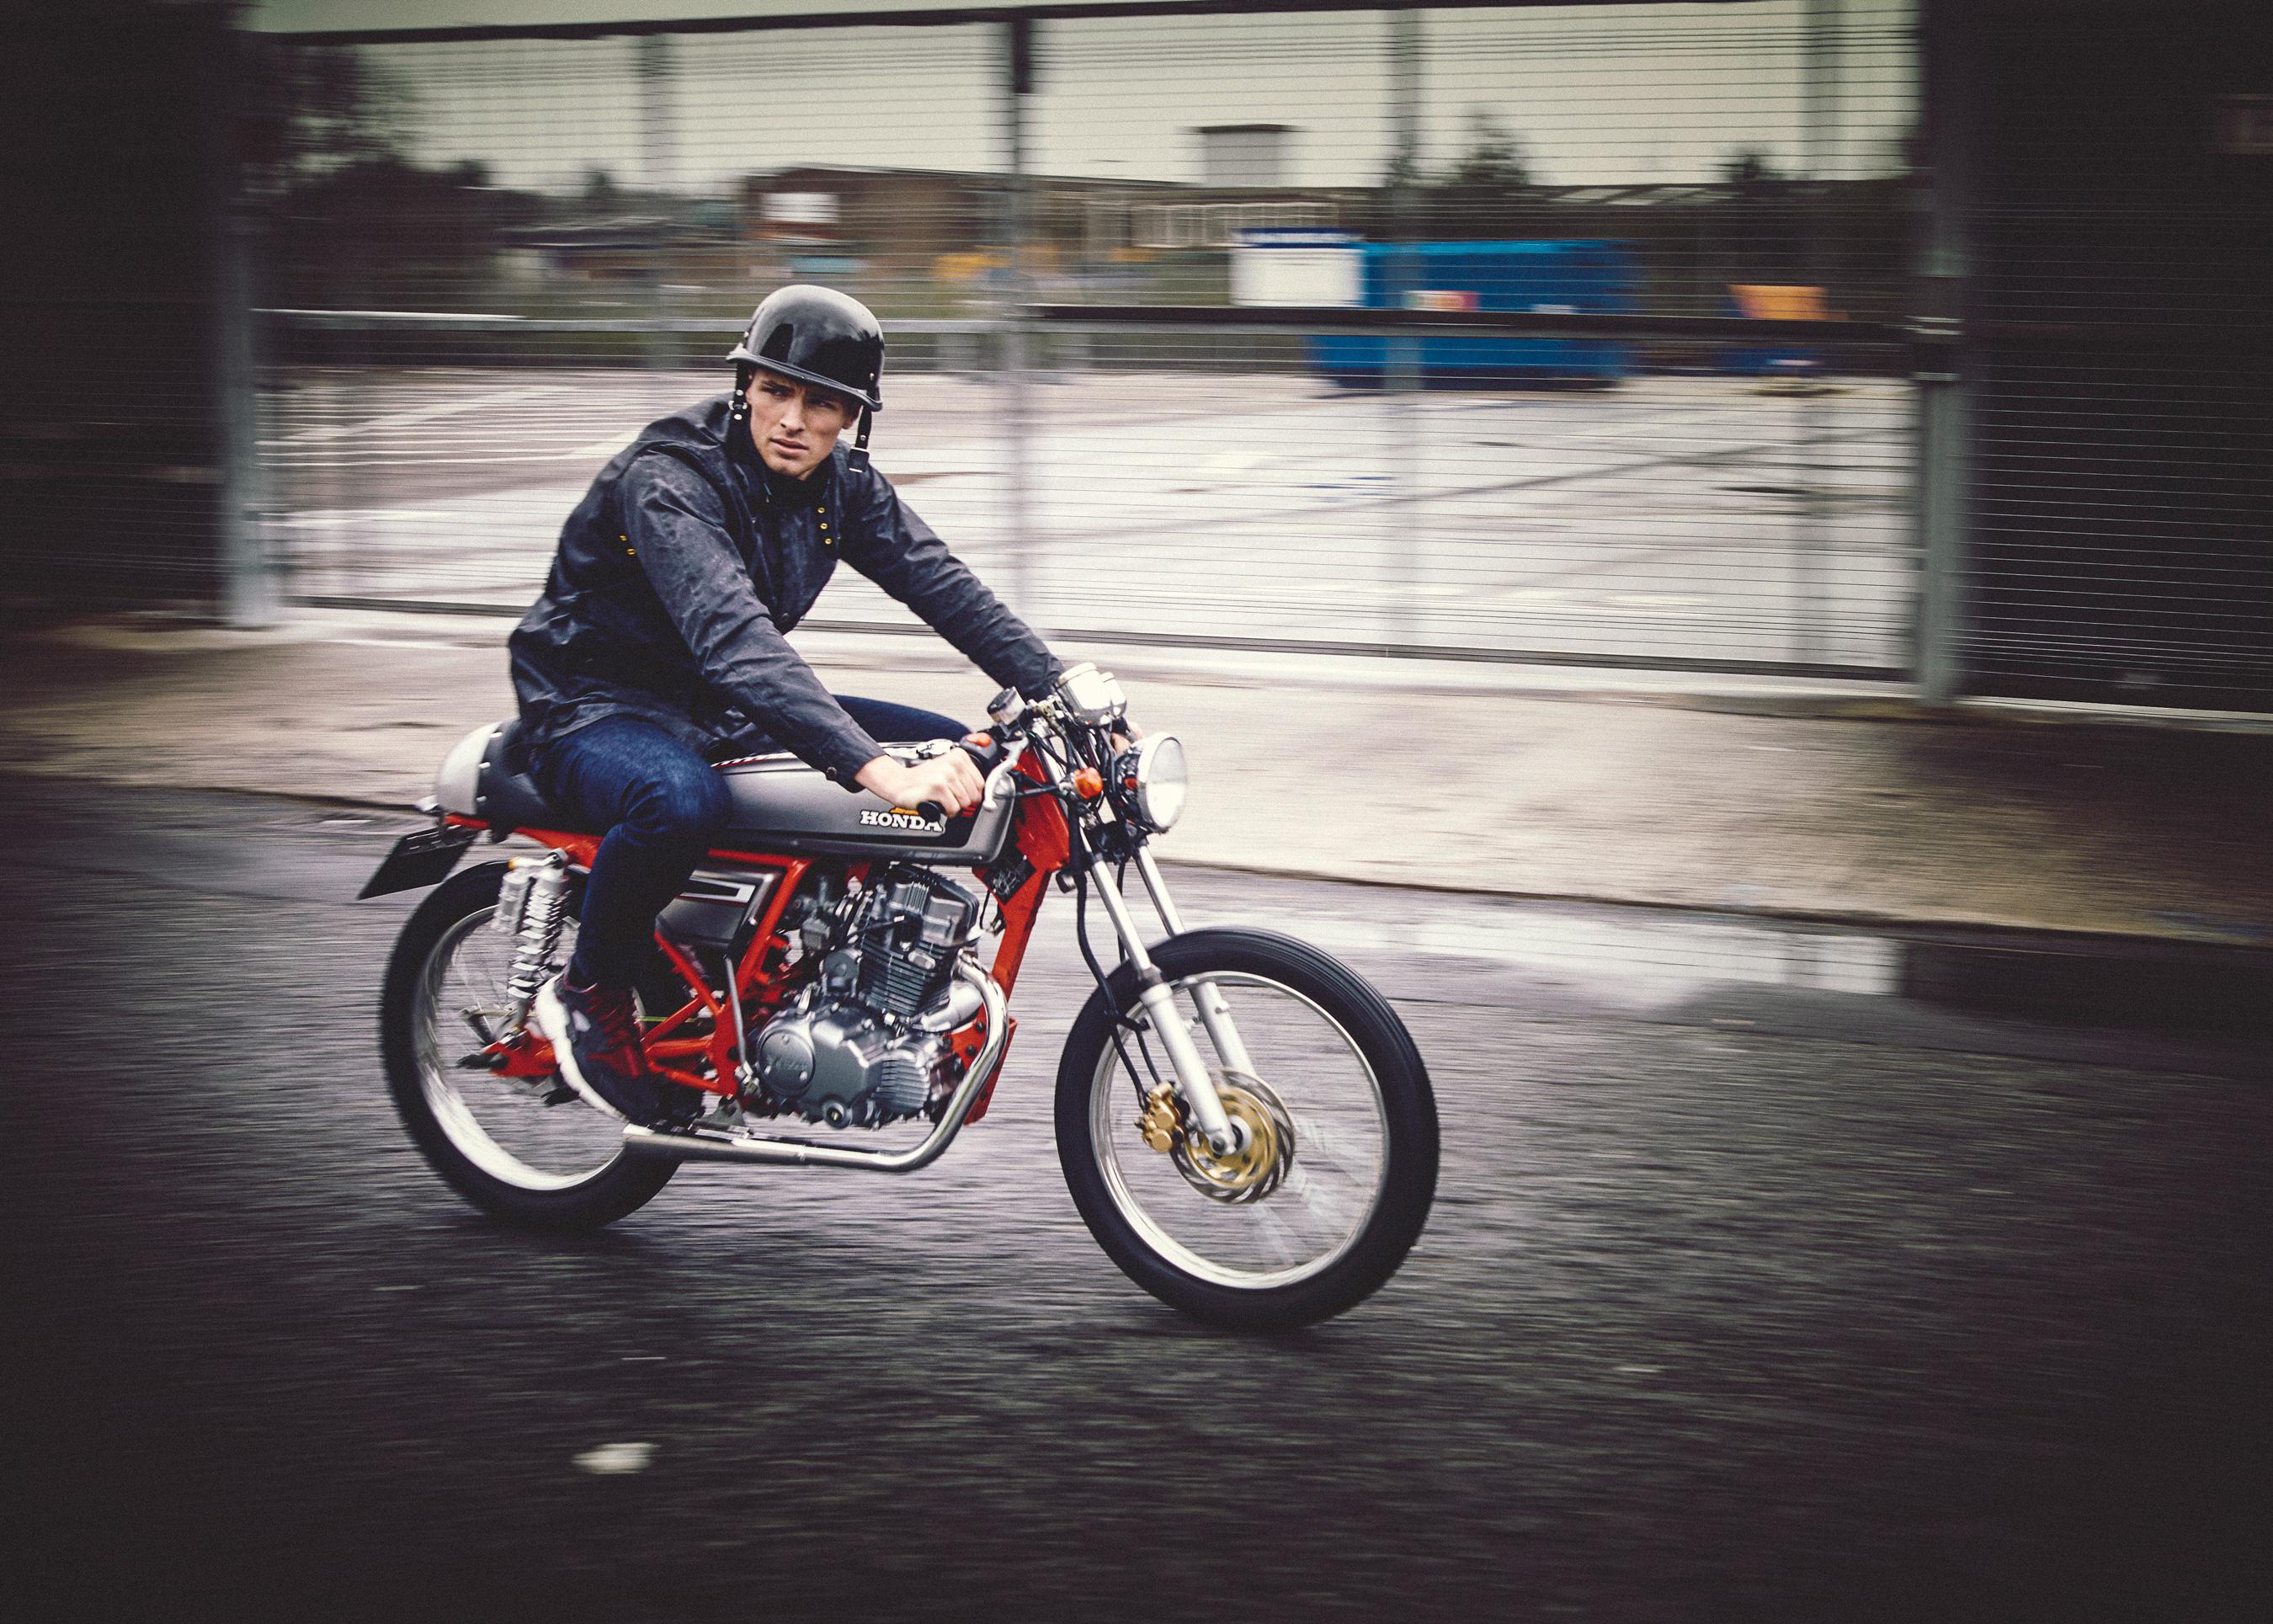 Matt-Stansfield-Photographer-editorial-fashion-lifestyle-edward-wilding-547